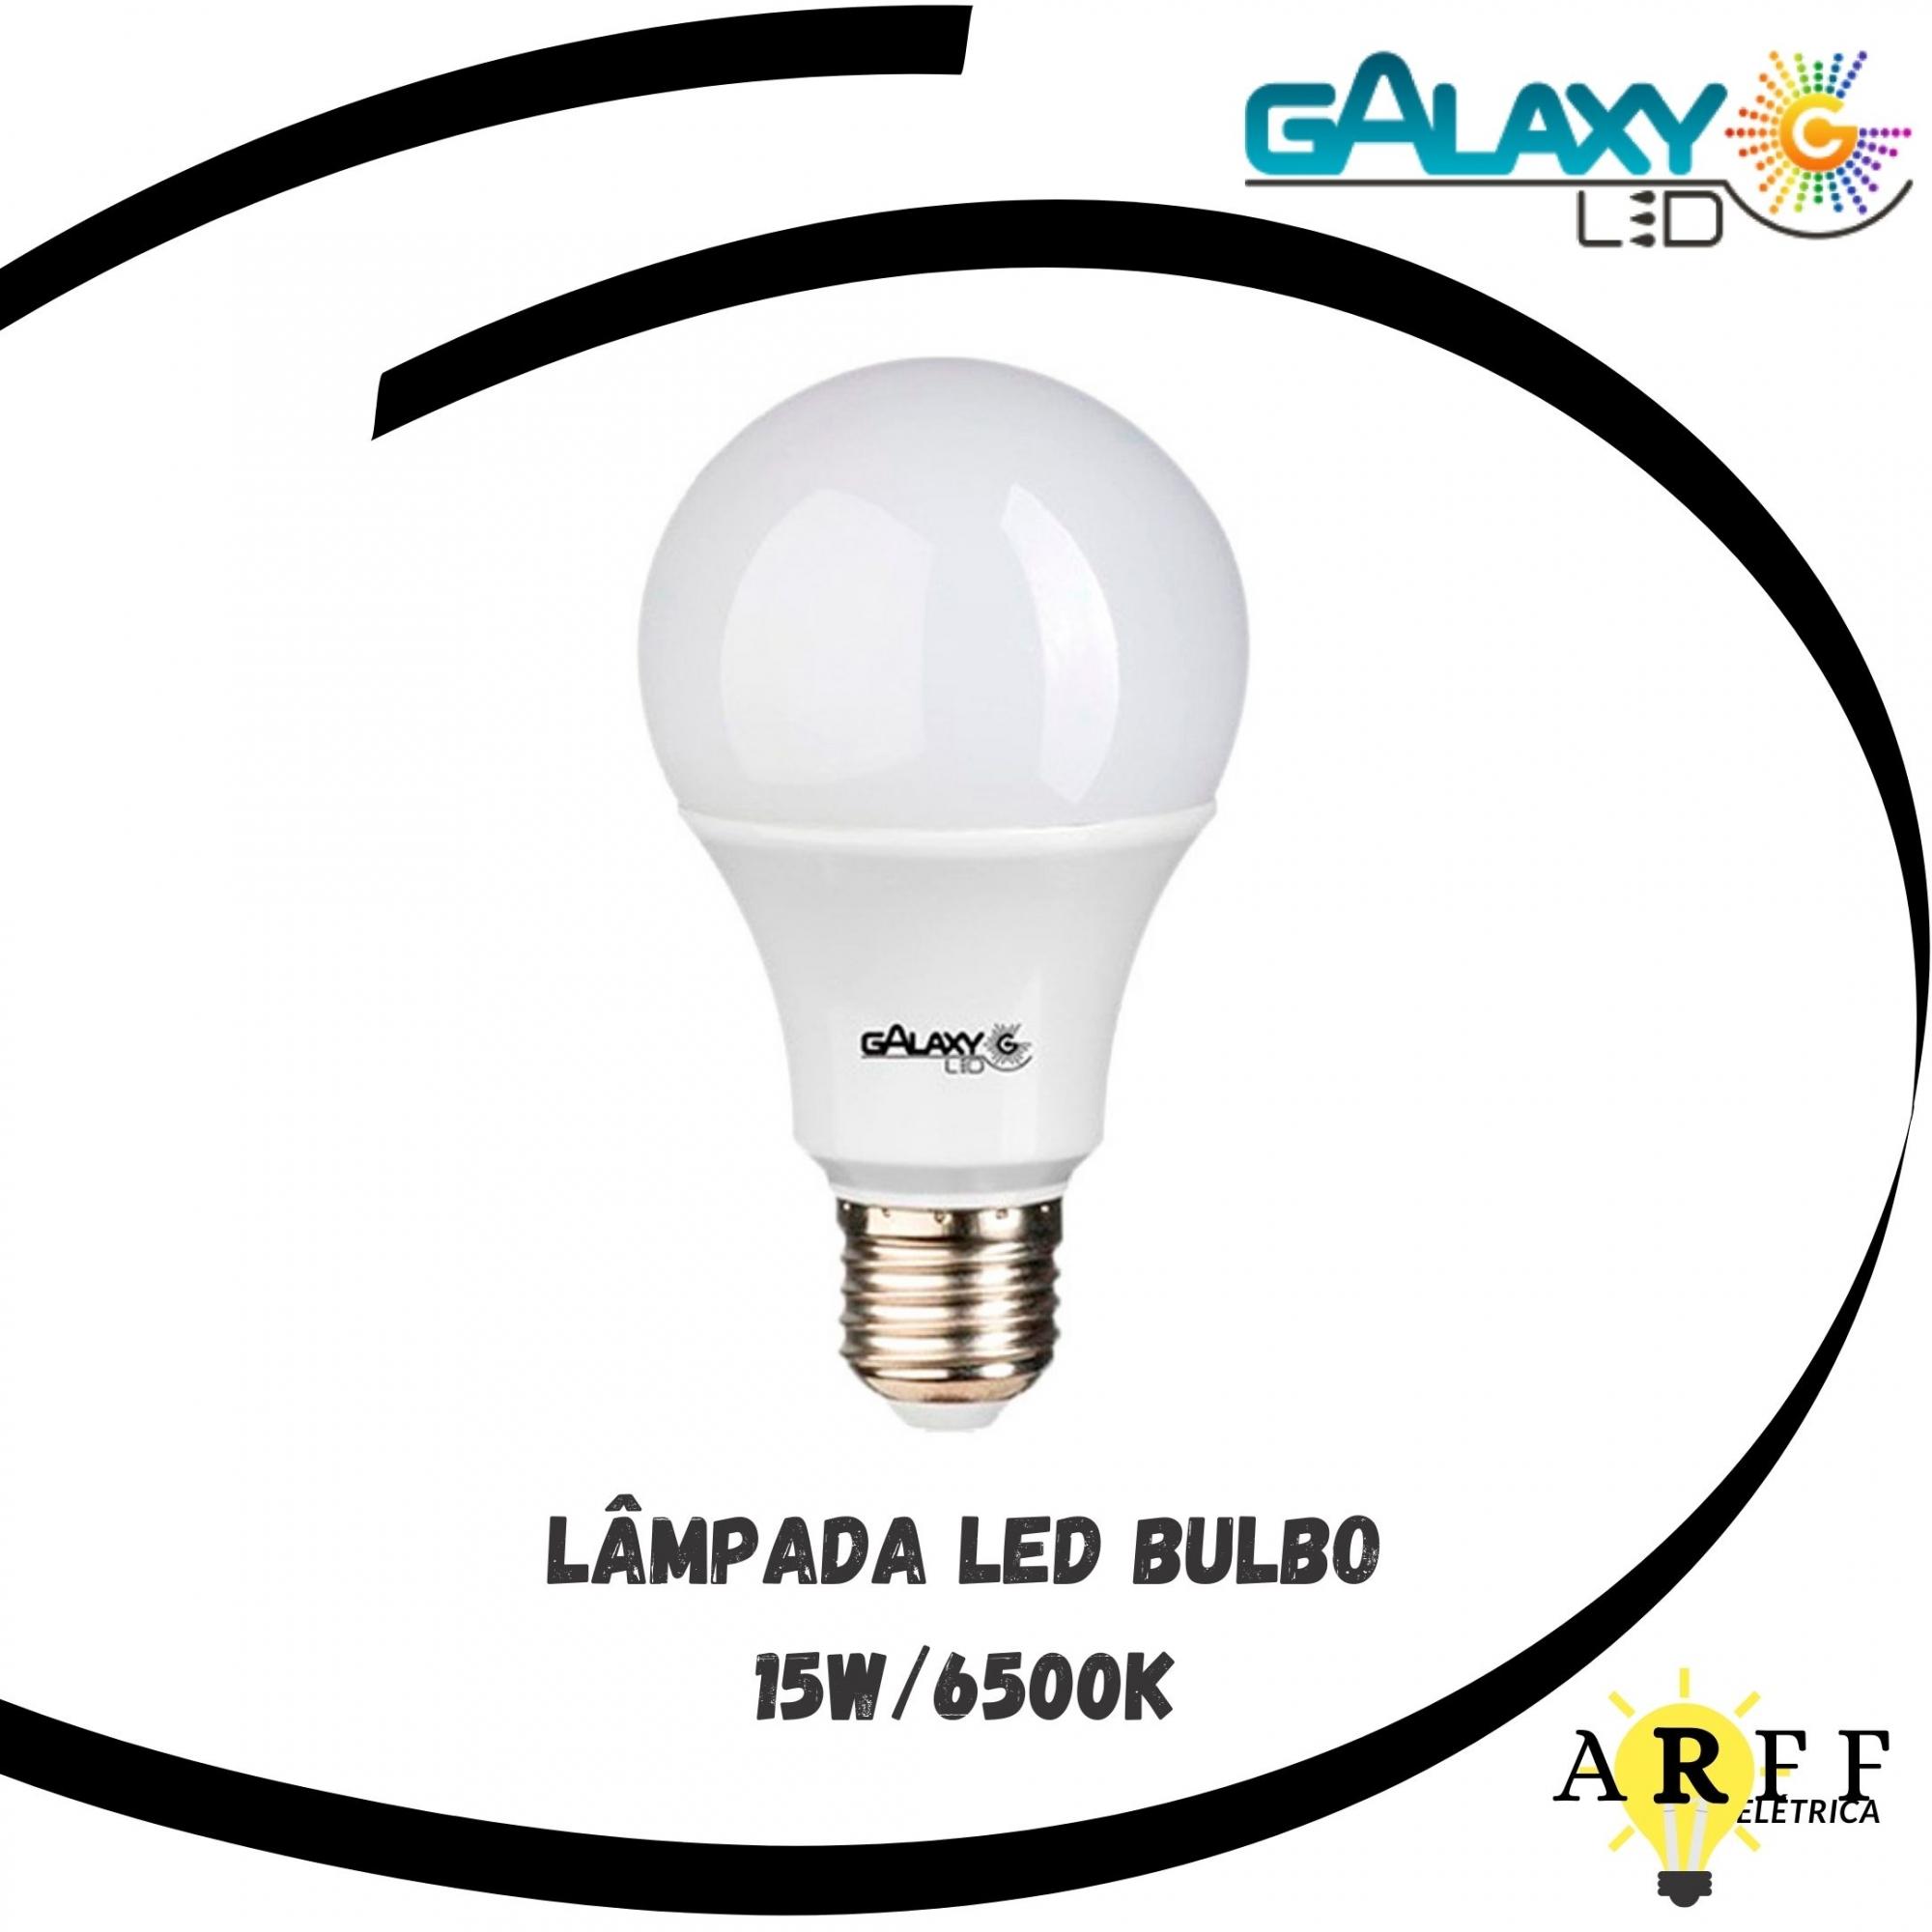 Lâmpada Led Bulbo 15W 6500k GALAXY LED